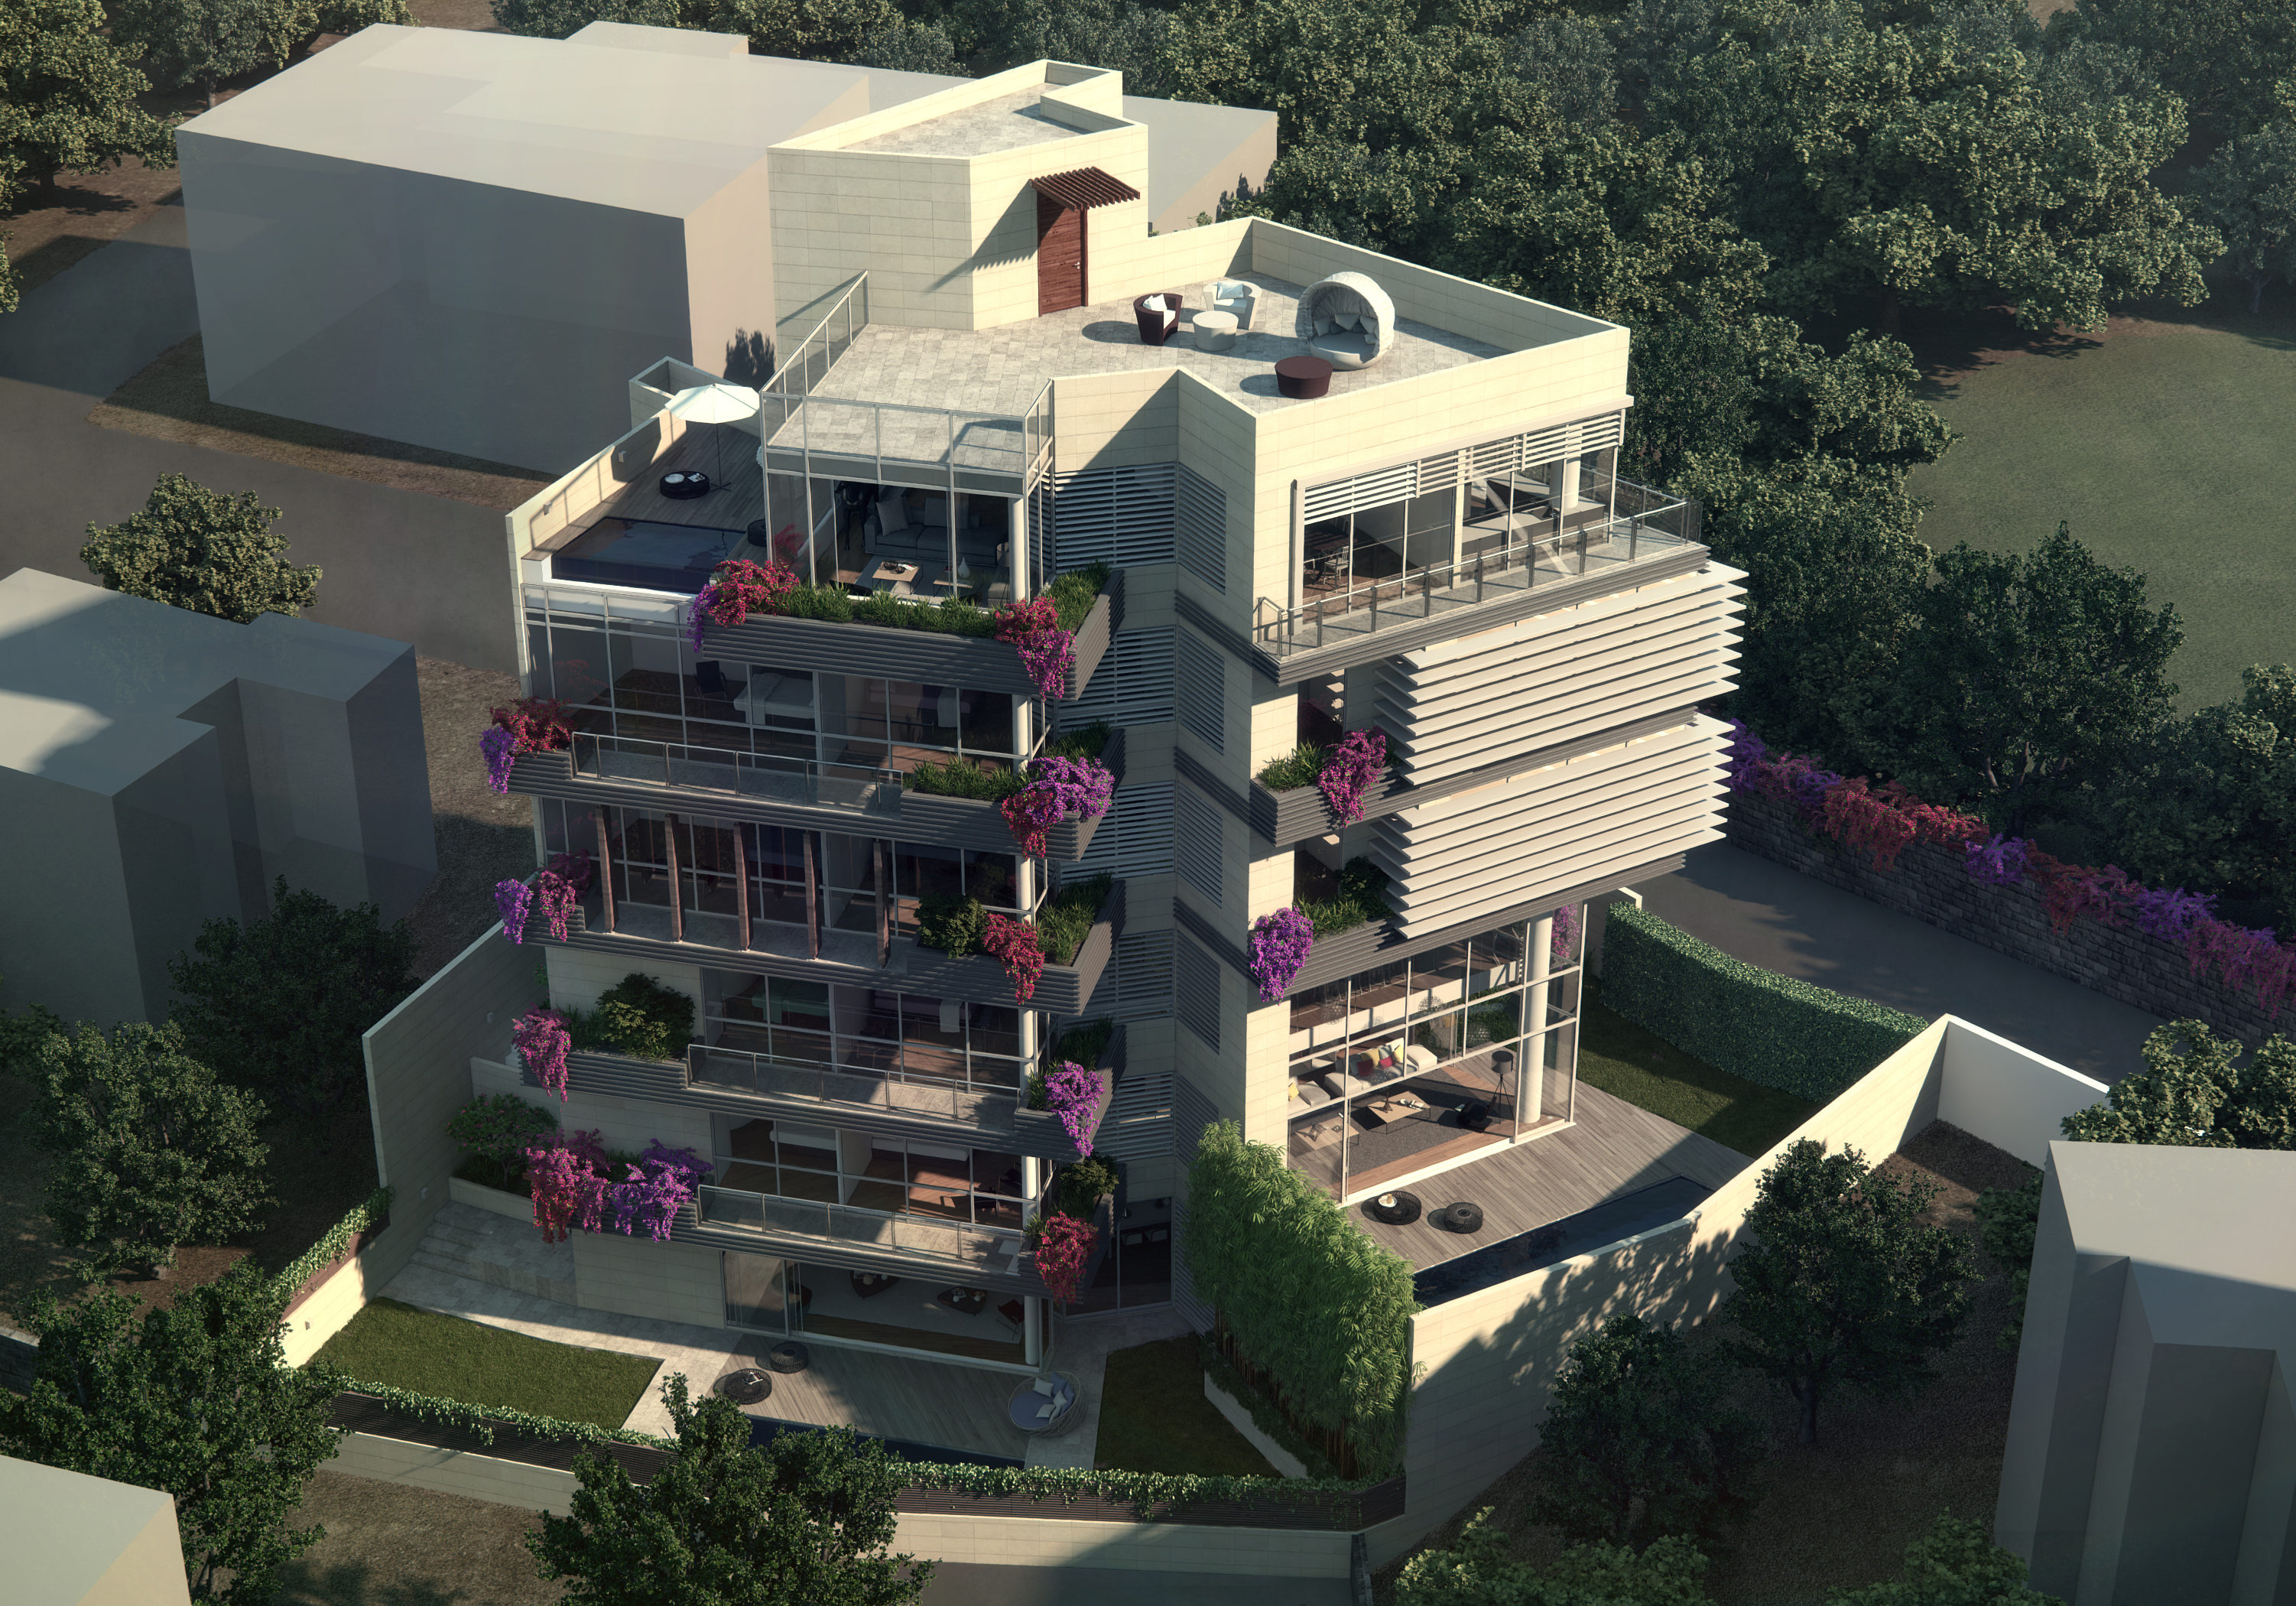 pali residences - 3 quadplex bungalows